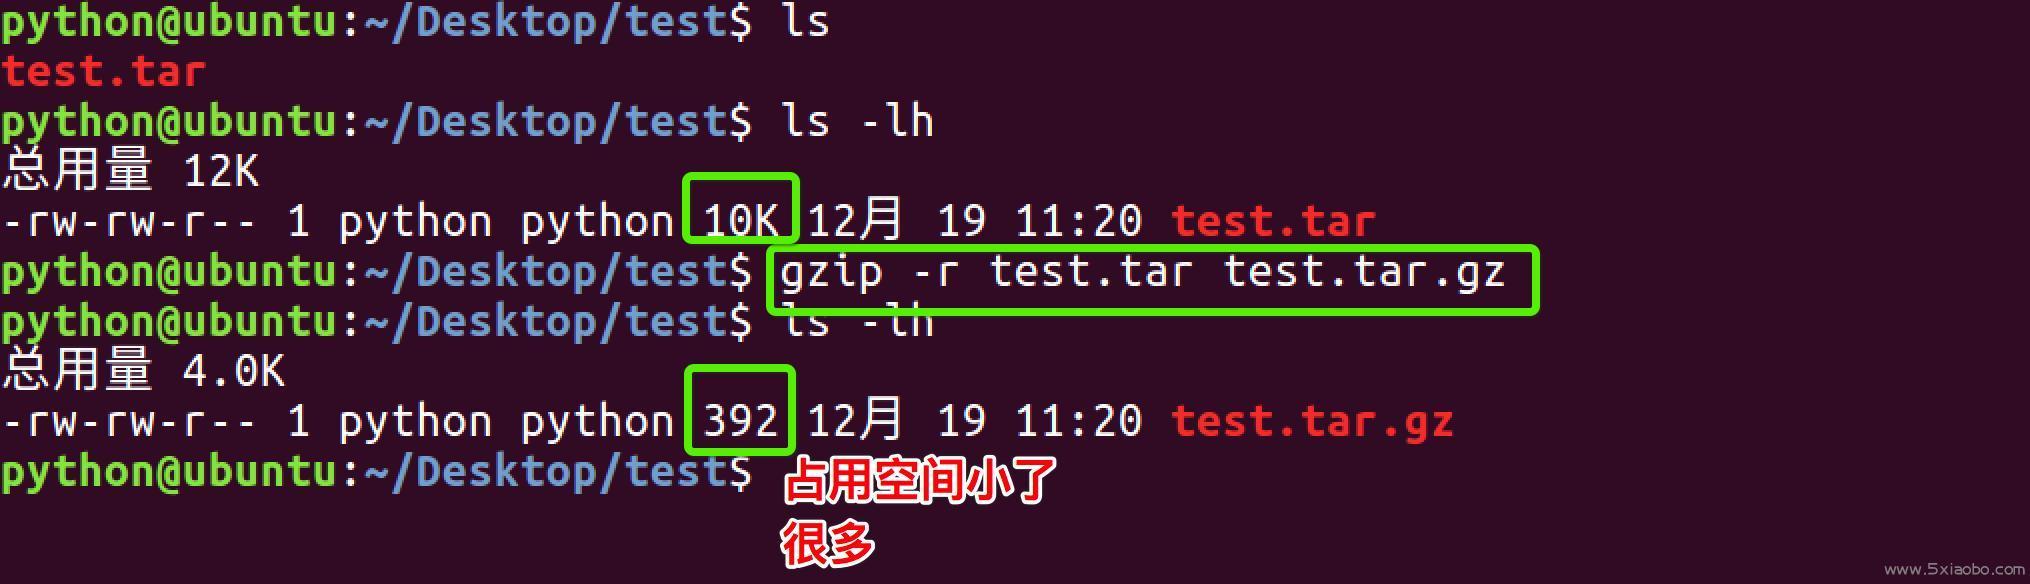 认识Linux命令--文件、磁盘管理  Linux 命令 第34张